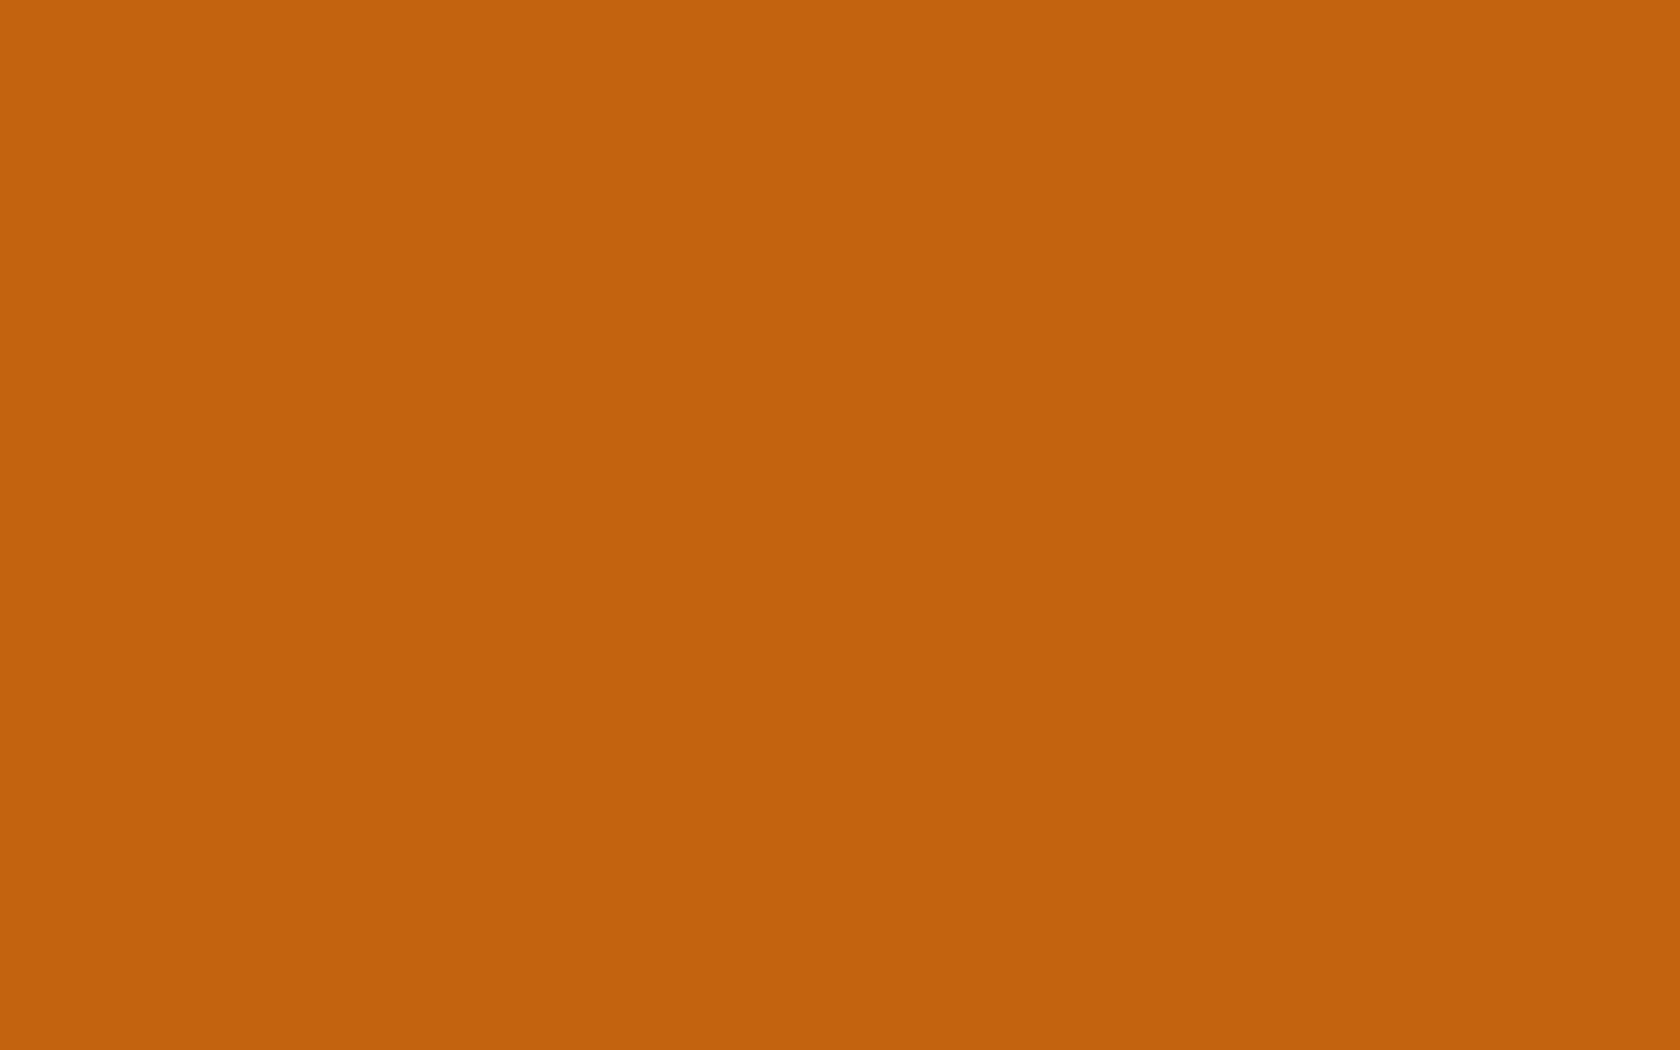 1680x1050 Alloy Orange Solid Color Background